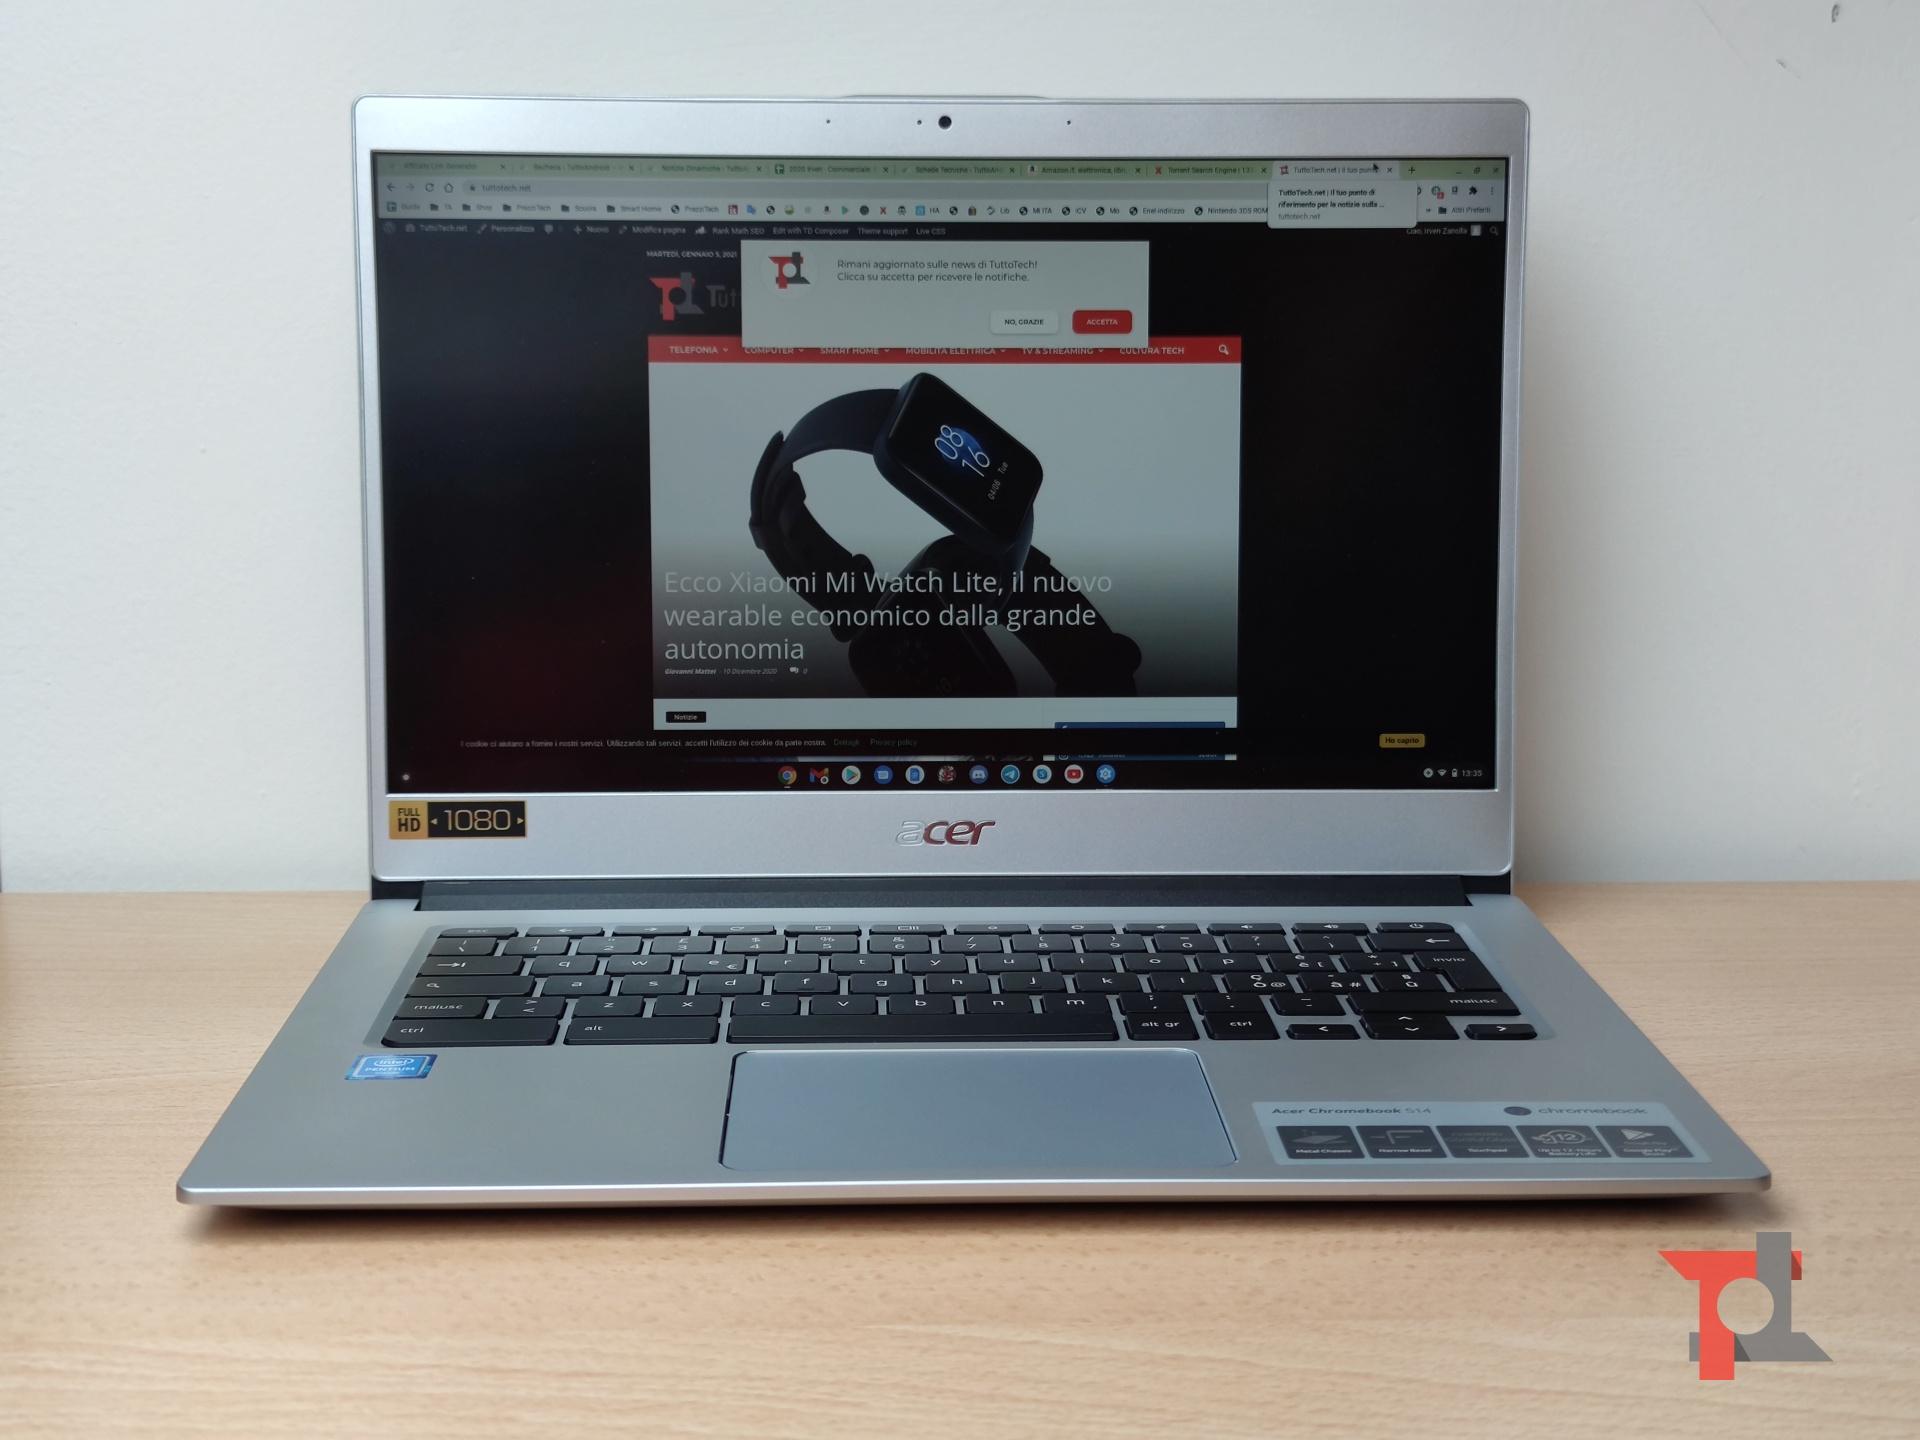 Recensione Acer Chromebook 514: può un Chromebook sostituire un classico notebook? 1